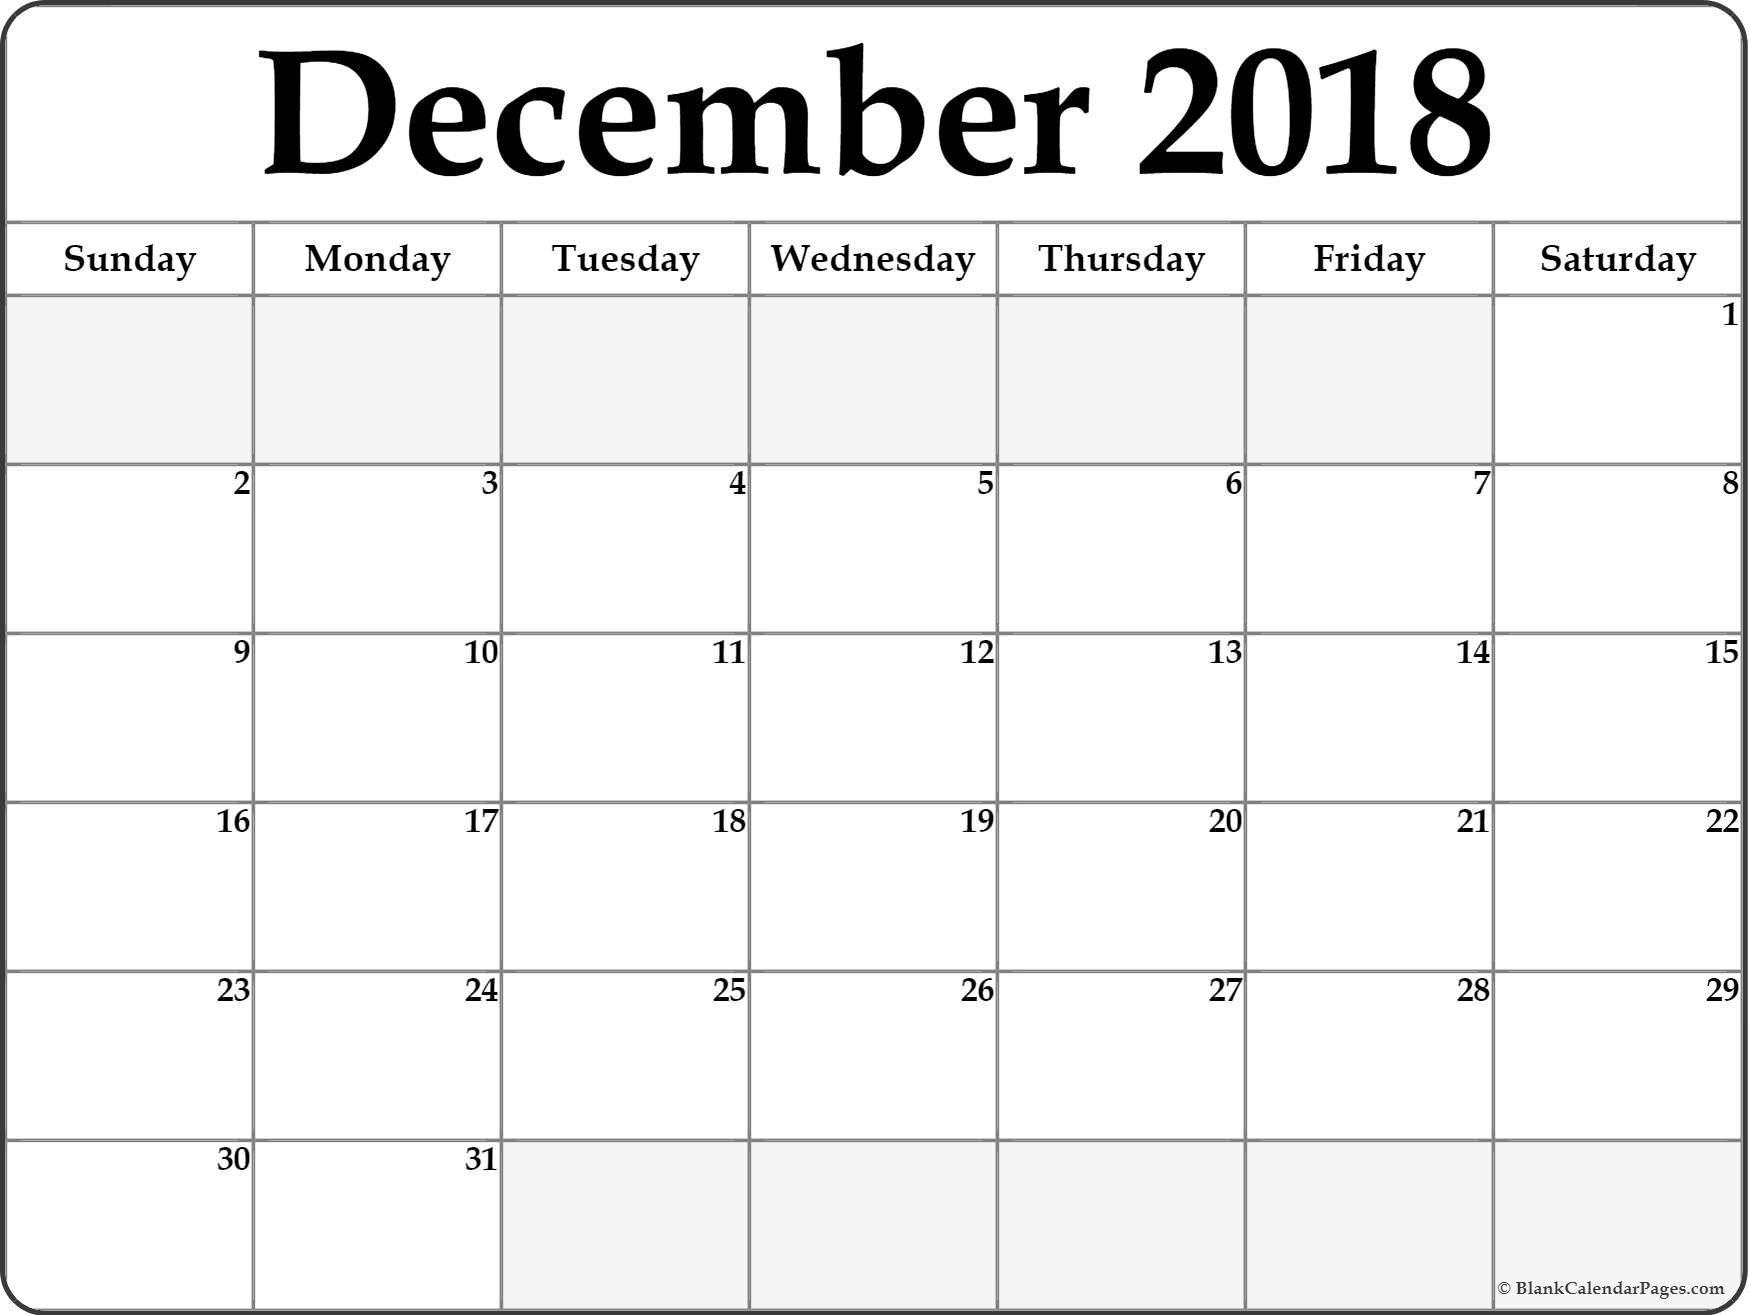 December 2018 Blank Calendar . December 2018 Calendar Printable intended for Blank Calendar Printable December Template